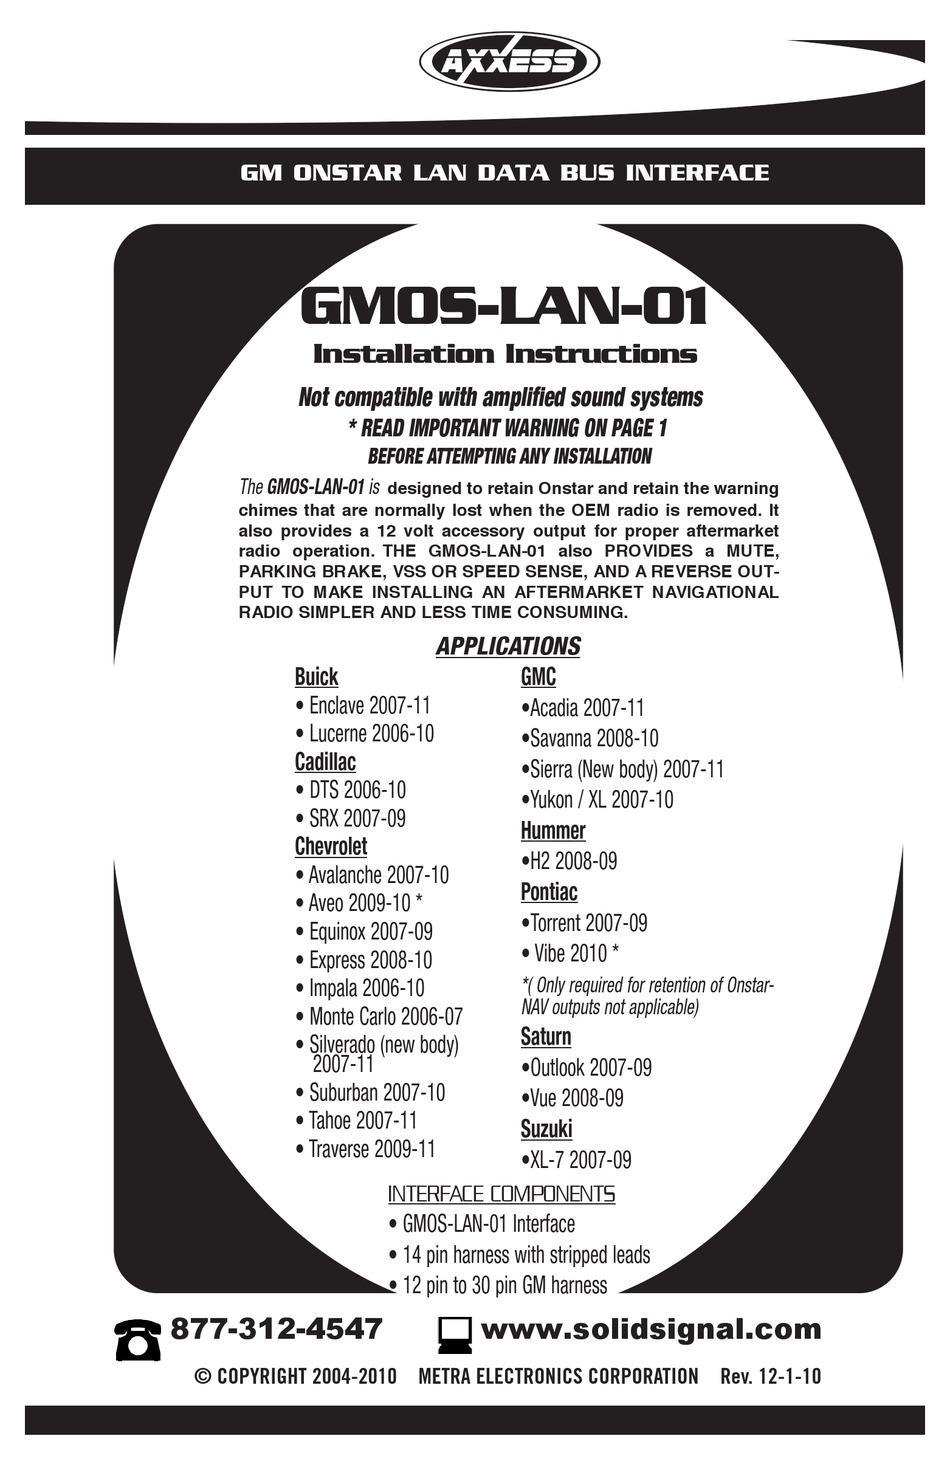 AXXESS GMOS-LAN-01 INSTALLATION INSTRUCTIONS MANUAL Pdf